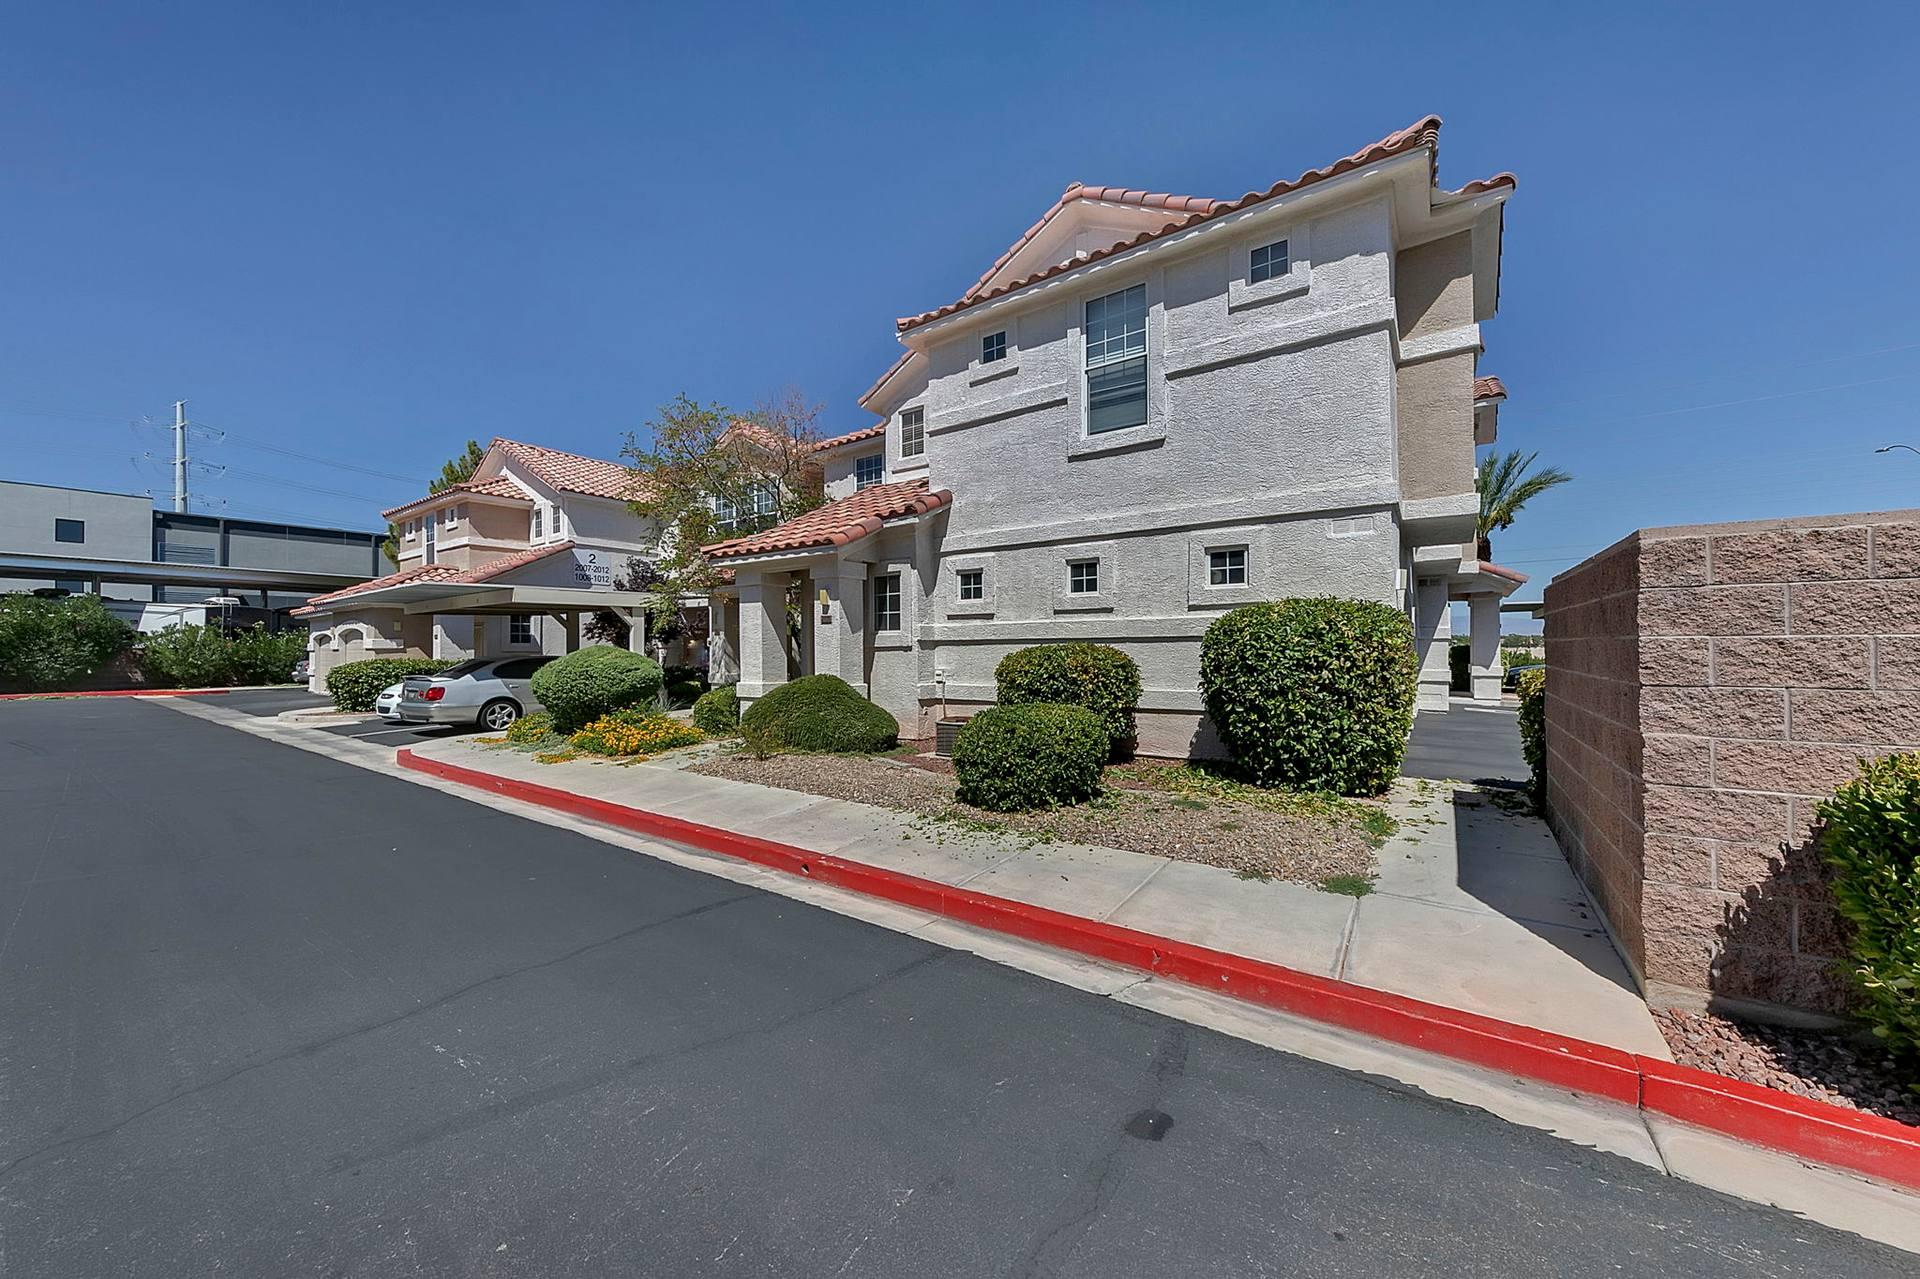 8555 W Russell Rd, Las Vegas, NV 89113, USA